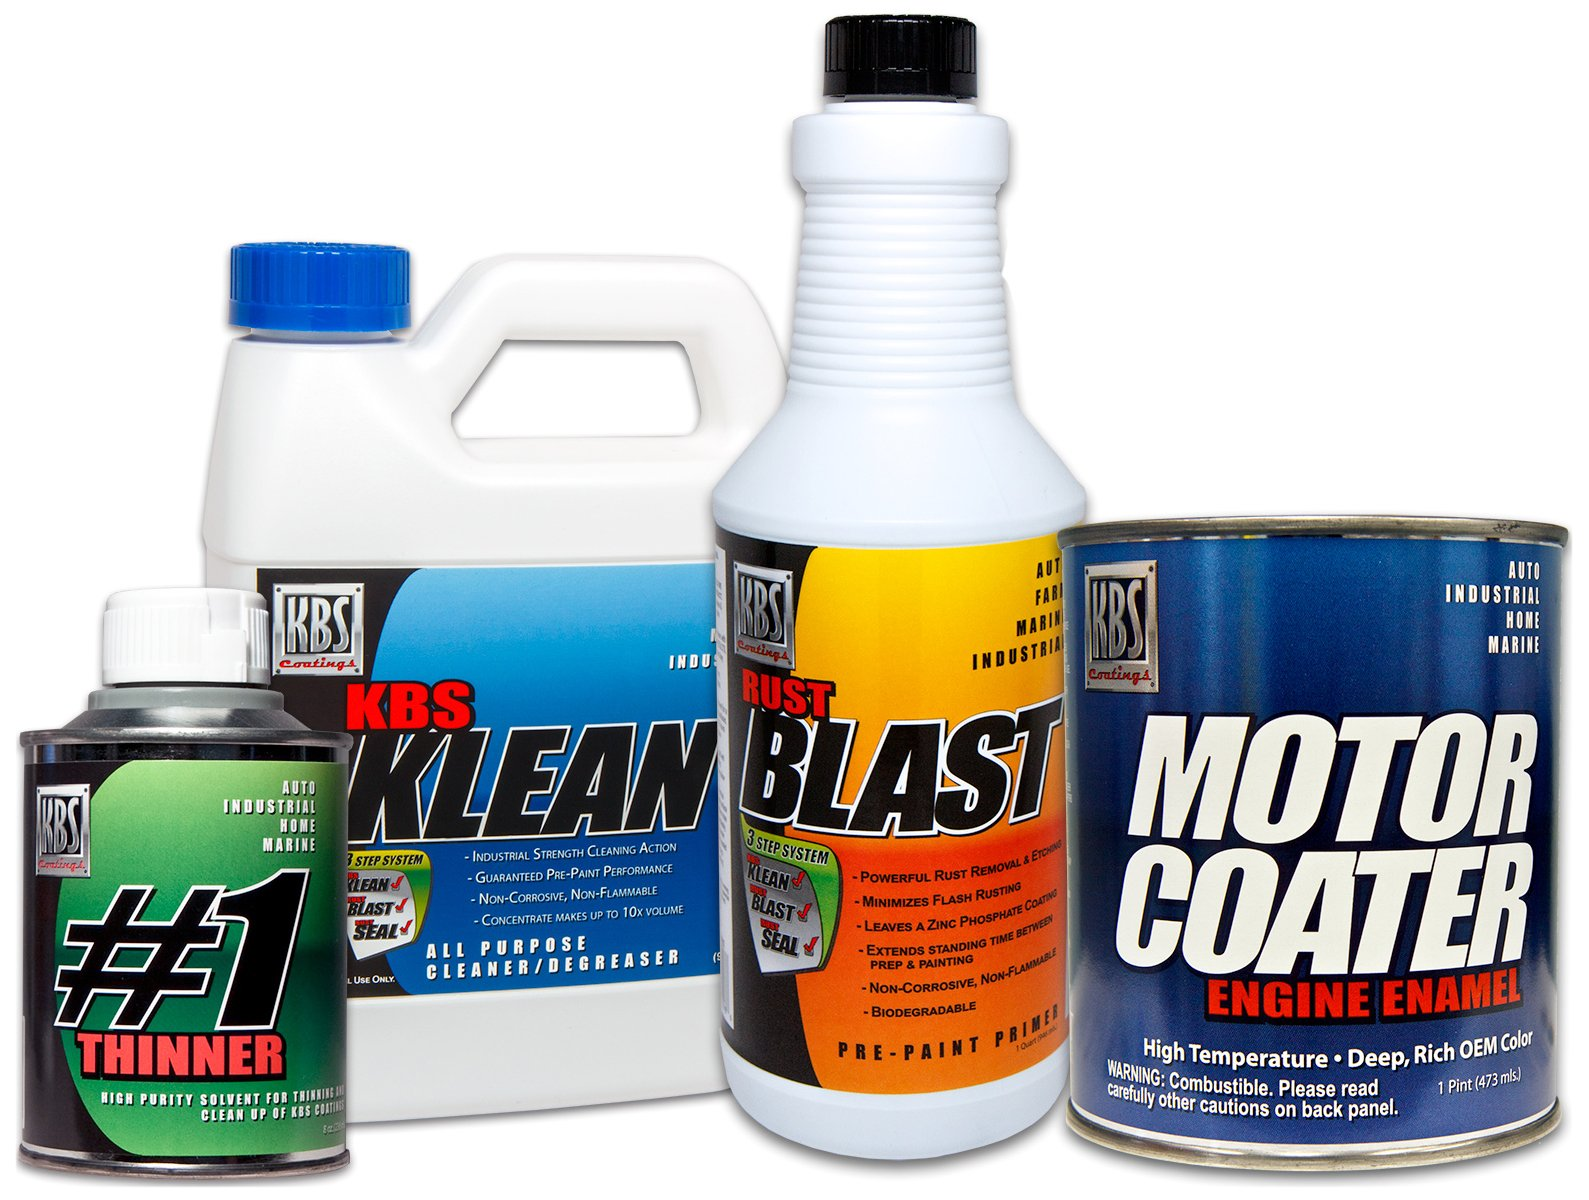 KBS Coatings 58020 Pontiac Light Blue Motor Coater Engine Paint Kit